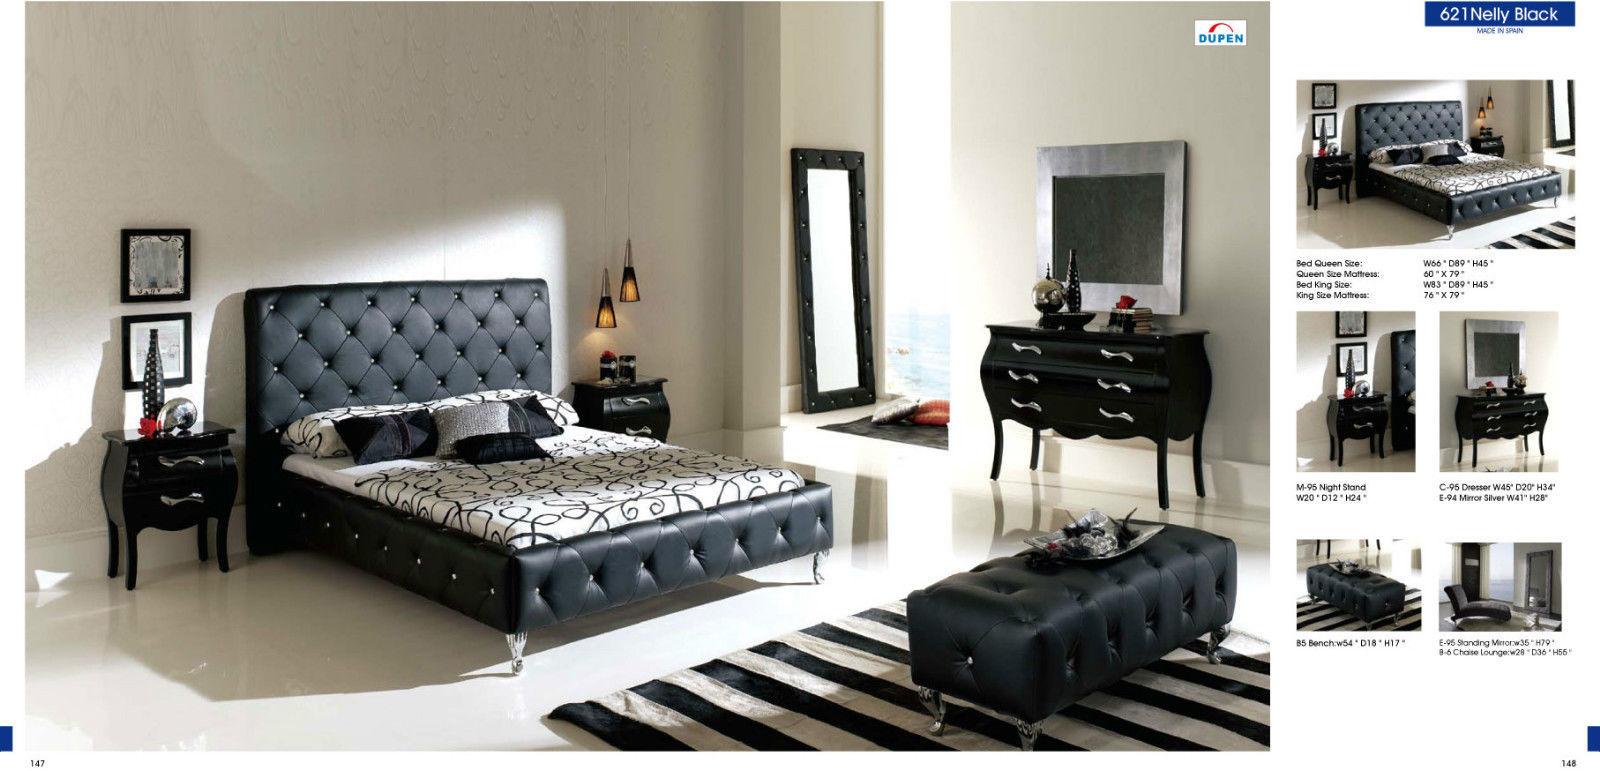 Monochrome Black White Bedroom Ea Reisurso And Aqua